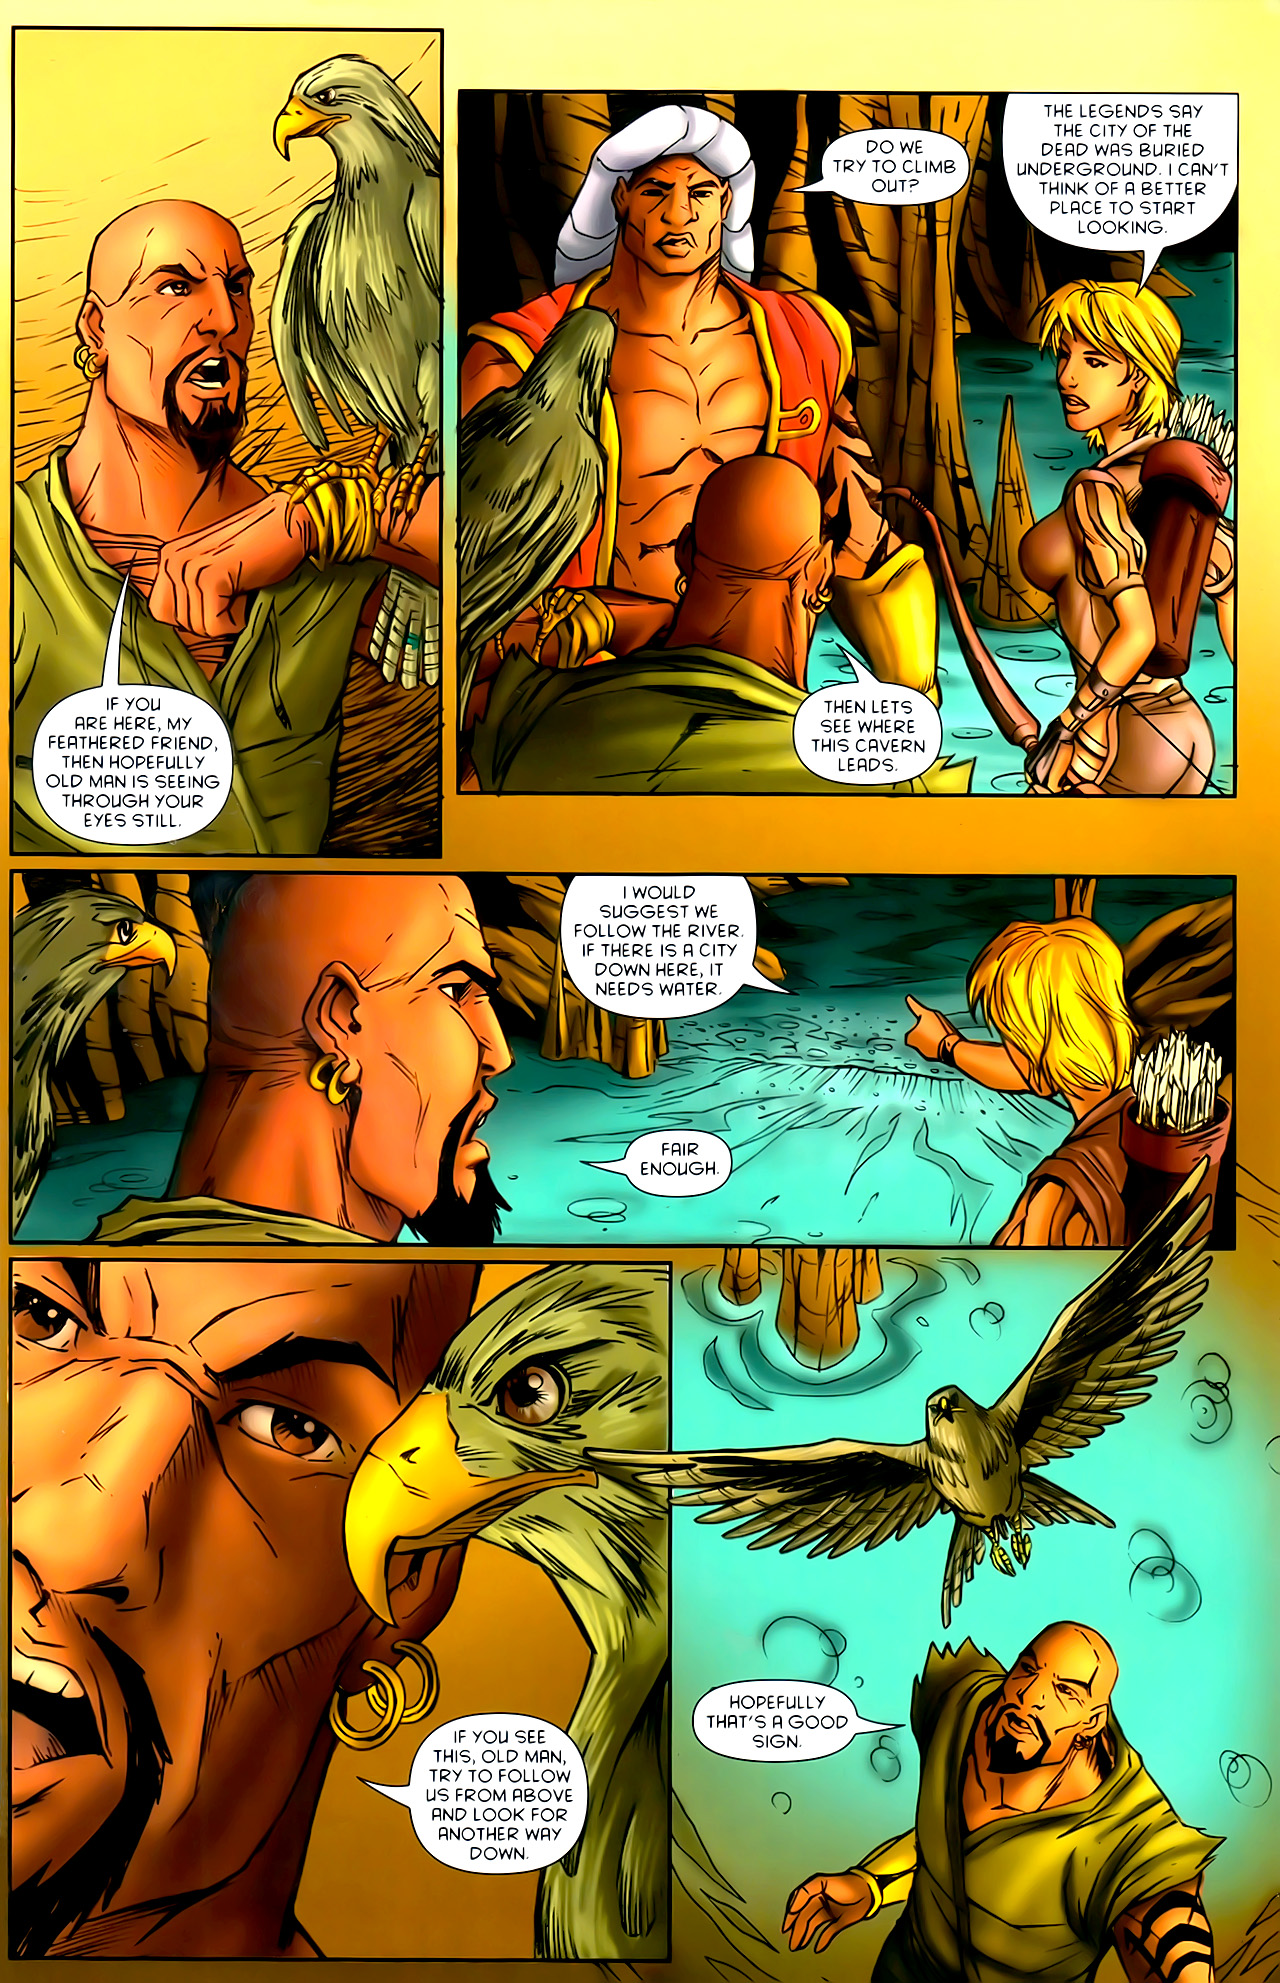 Read online 1001 Arabian Nights: The Adventures of Sinbad comic -  Issue #10 - 6